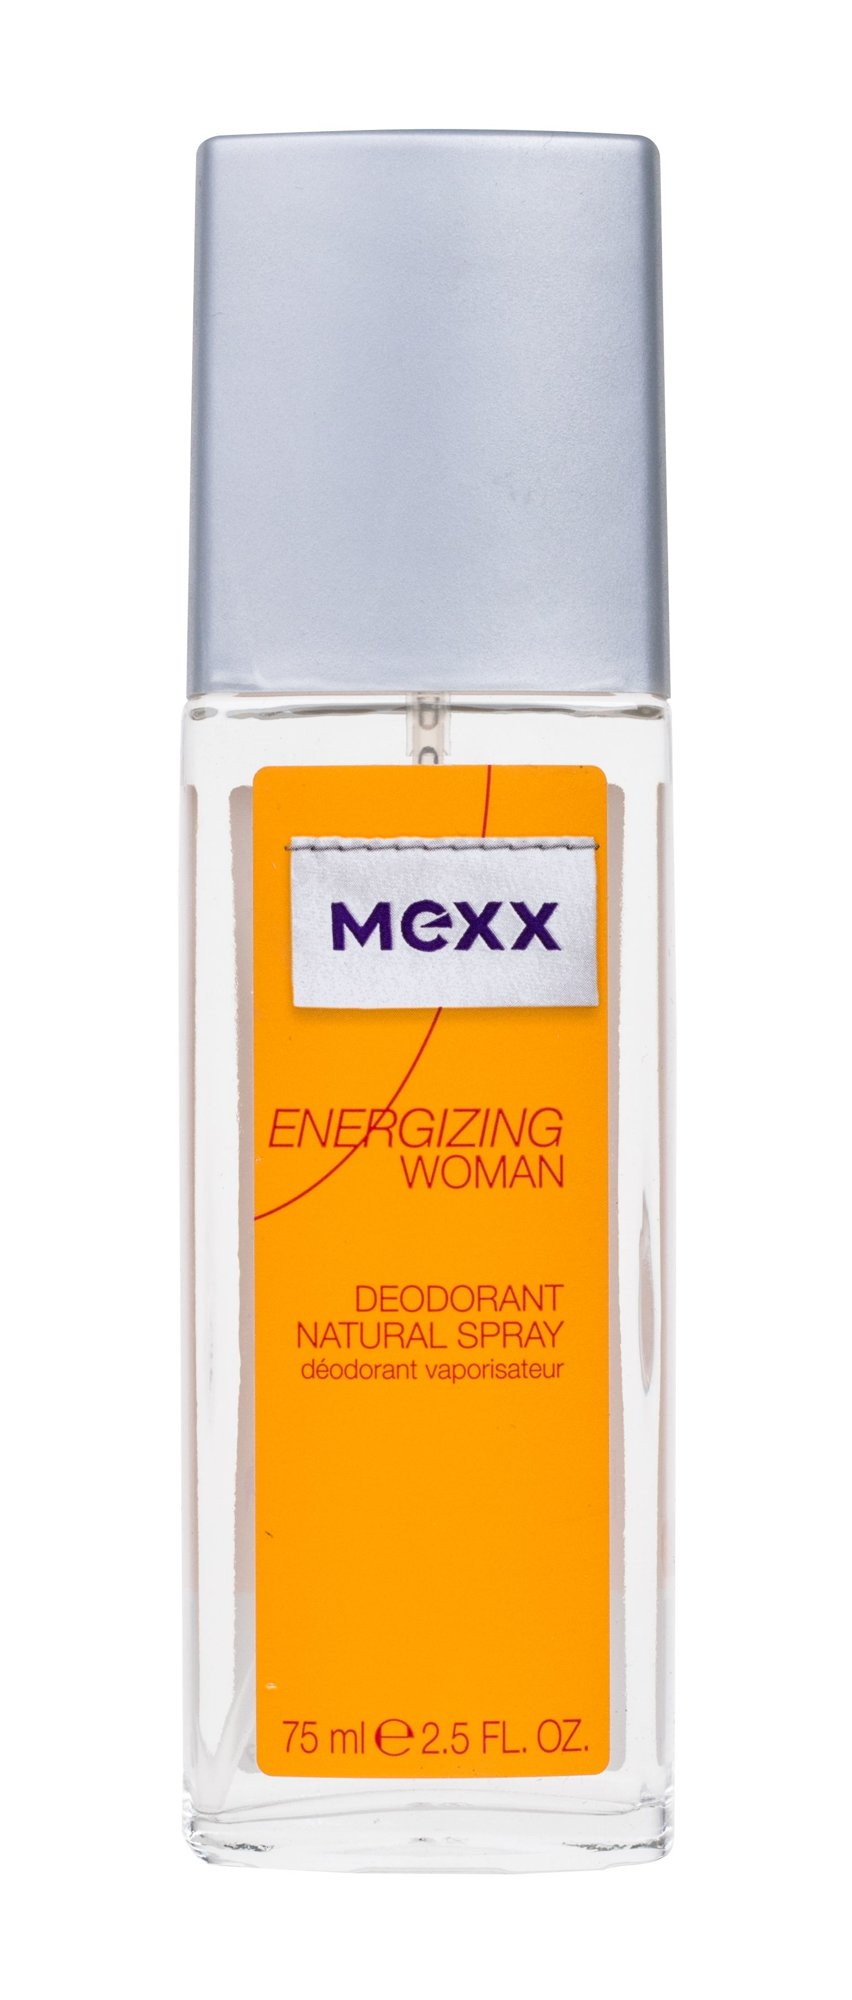 Mexx Energizing Woman Deodorant 75ml